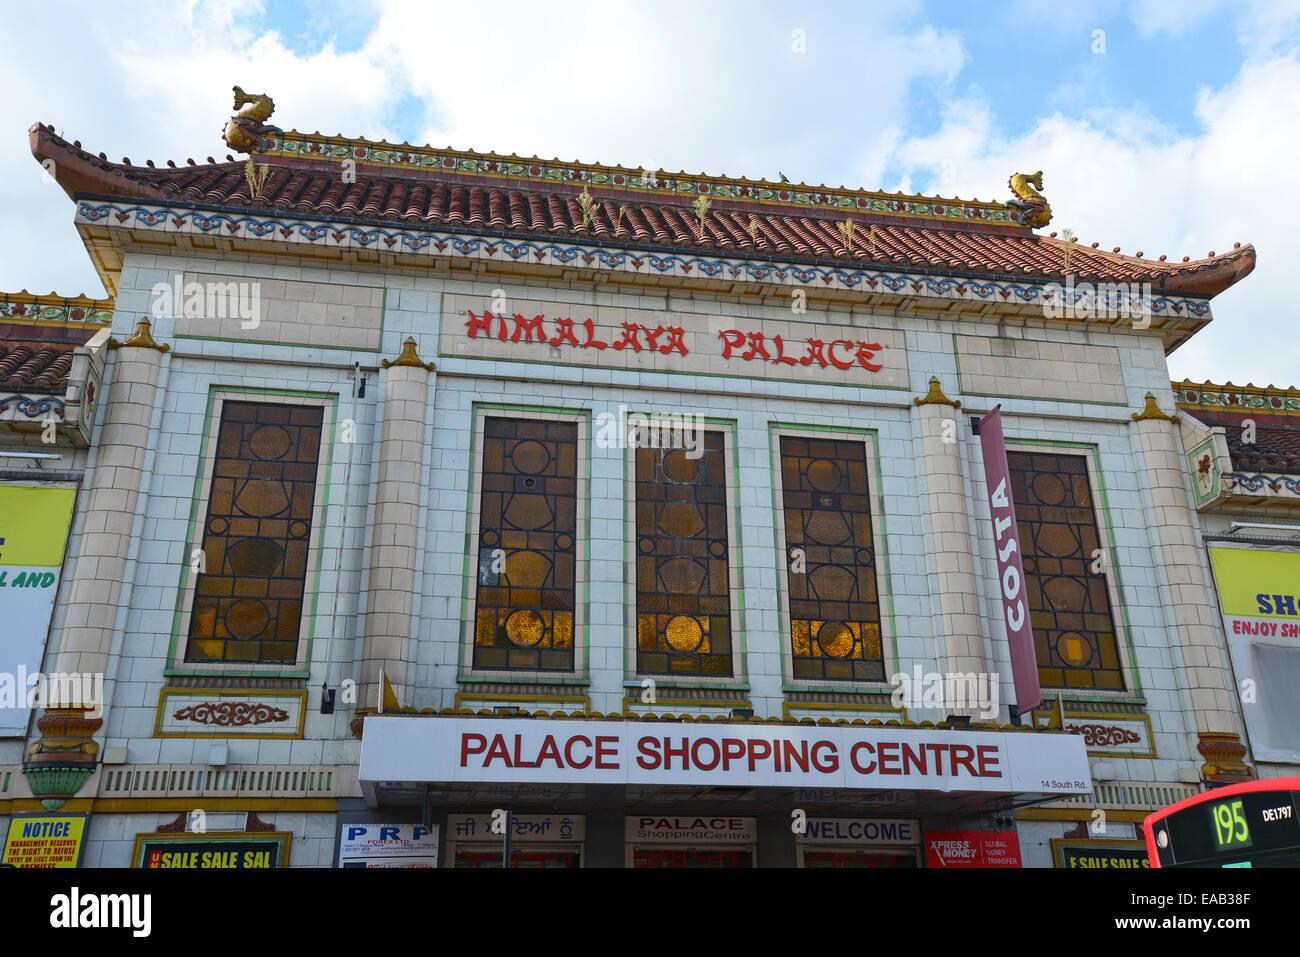 Himalaya Palace Cinema, South Road, Southall, London Borough of Ealing, Greater London, England, United Kingdom - Stock Image